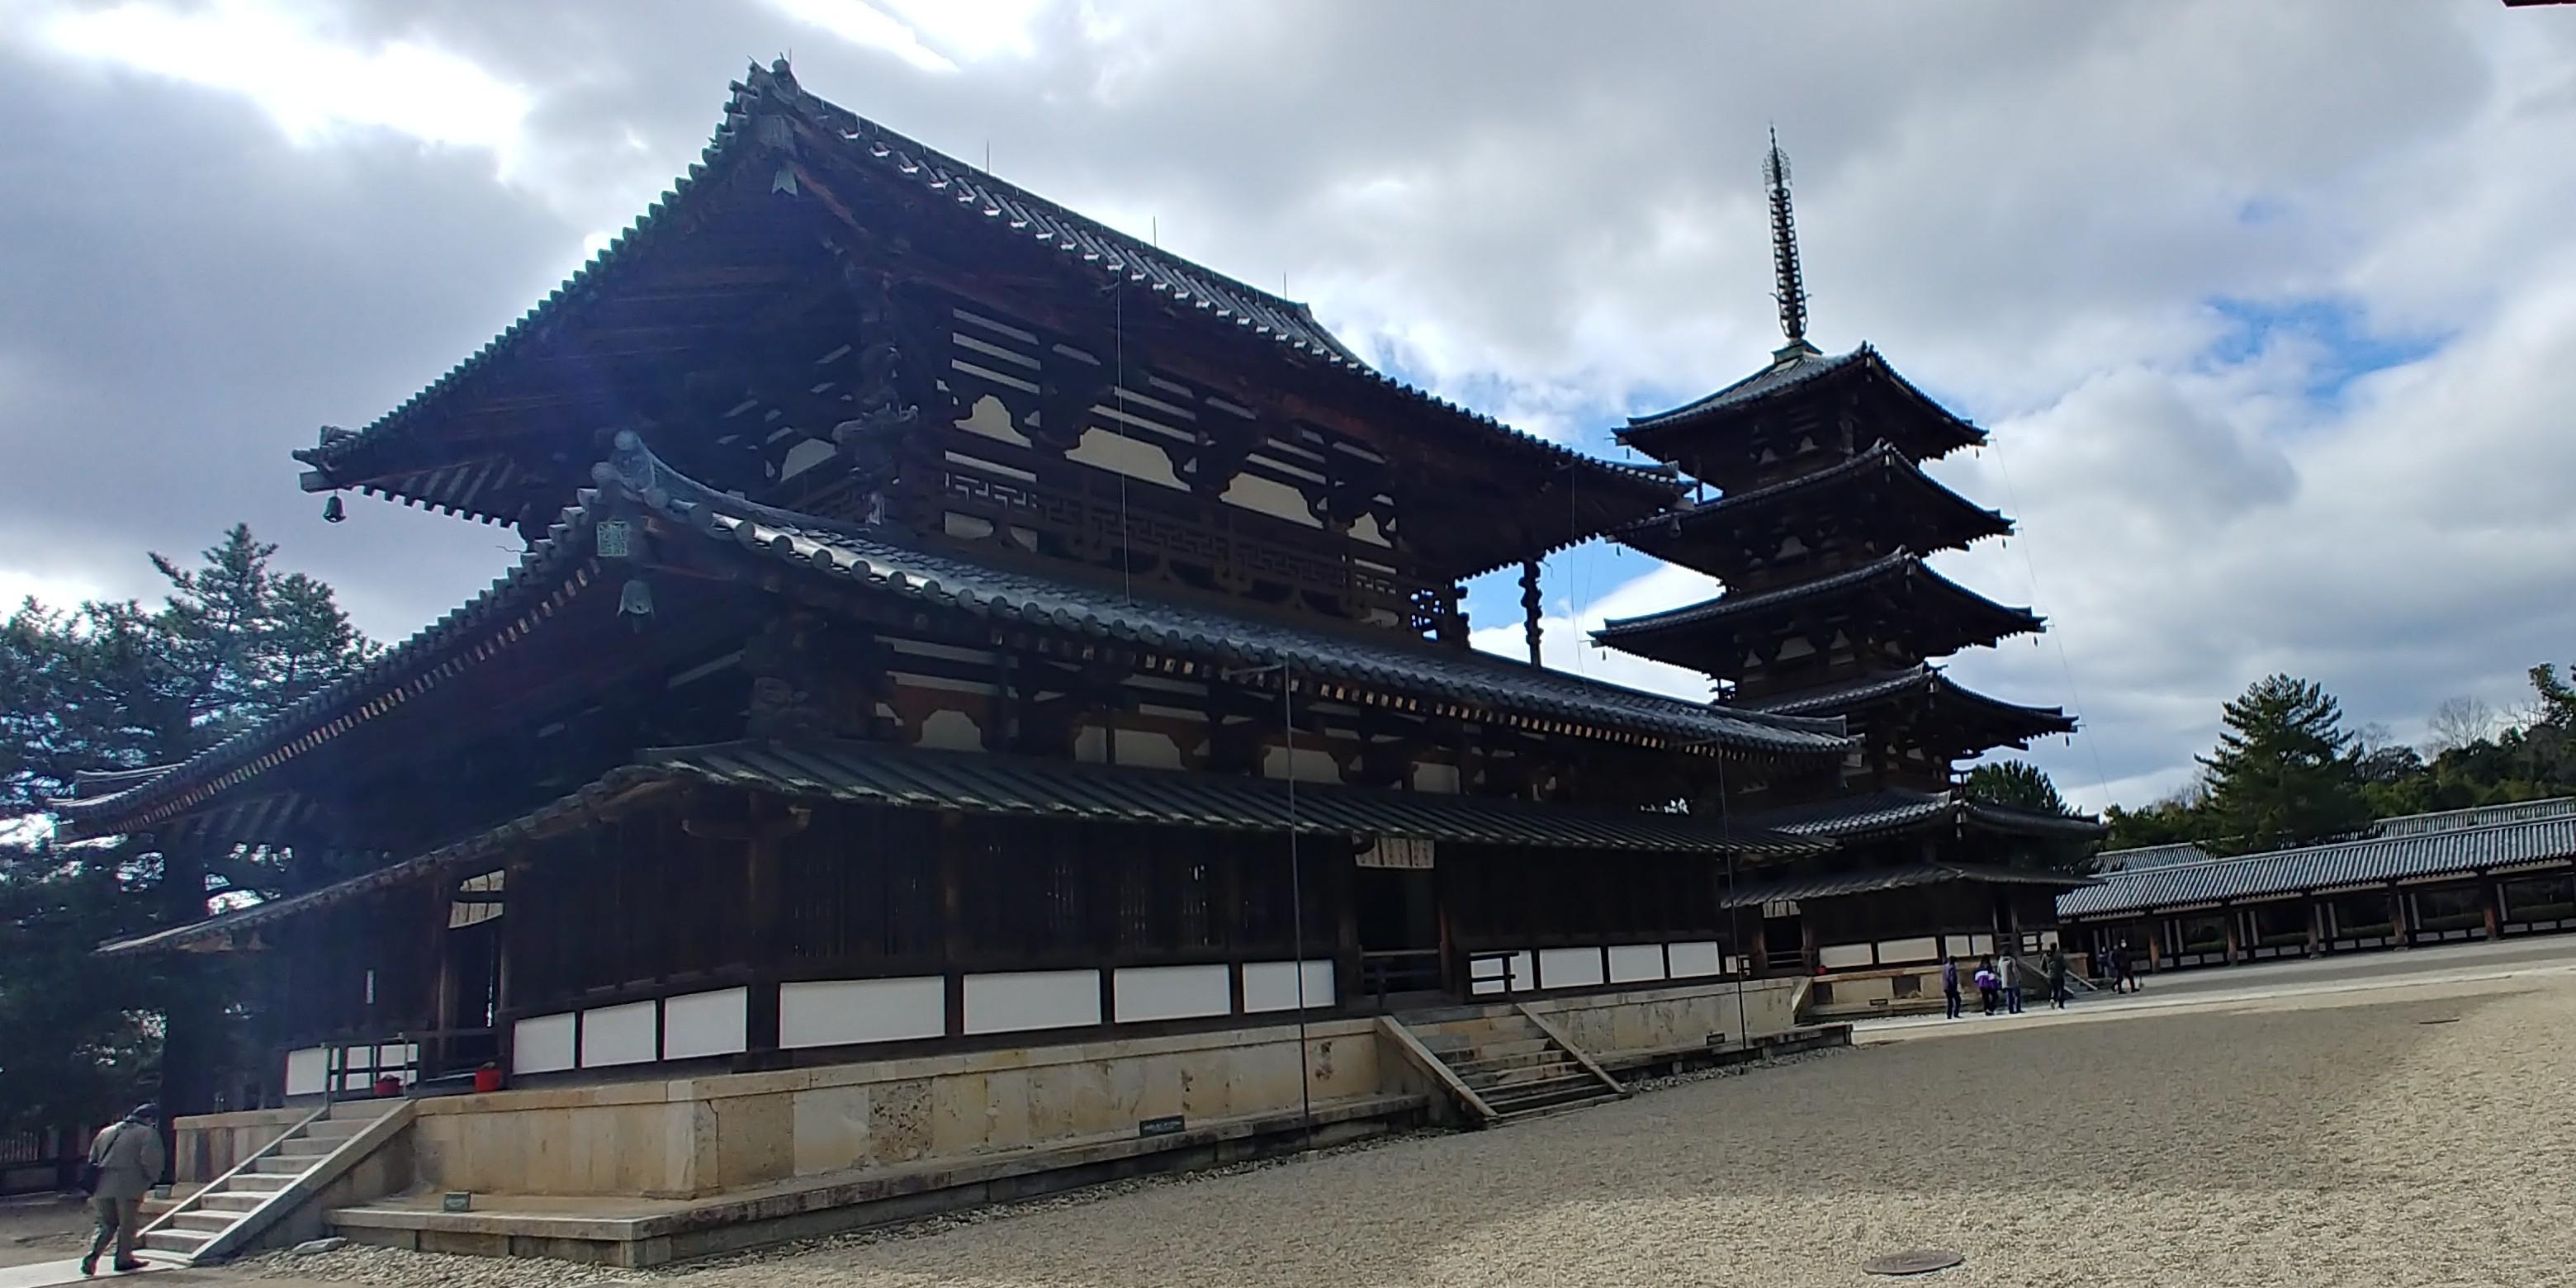 f:id:kishuji-kaisoku:20200212162556j:image